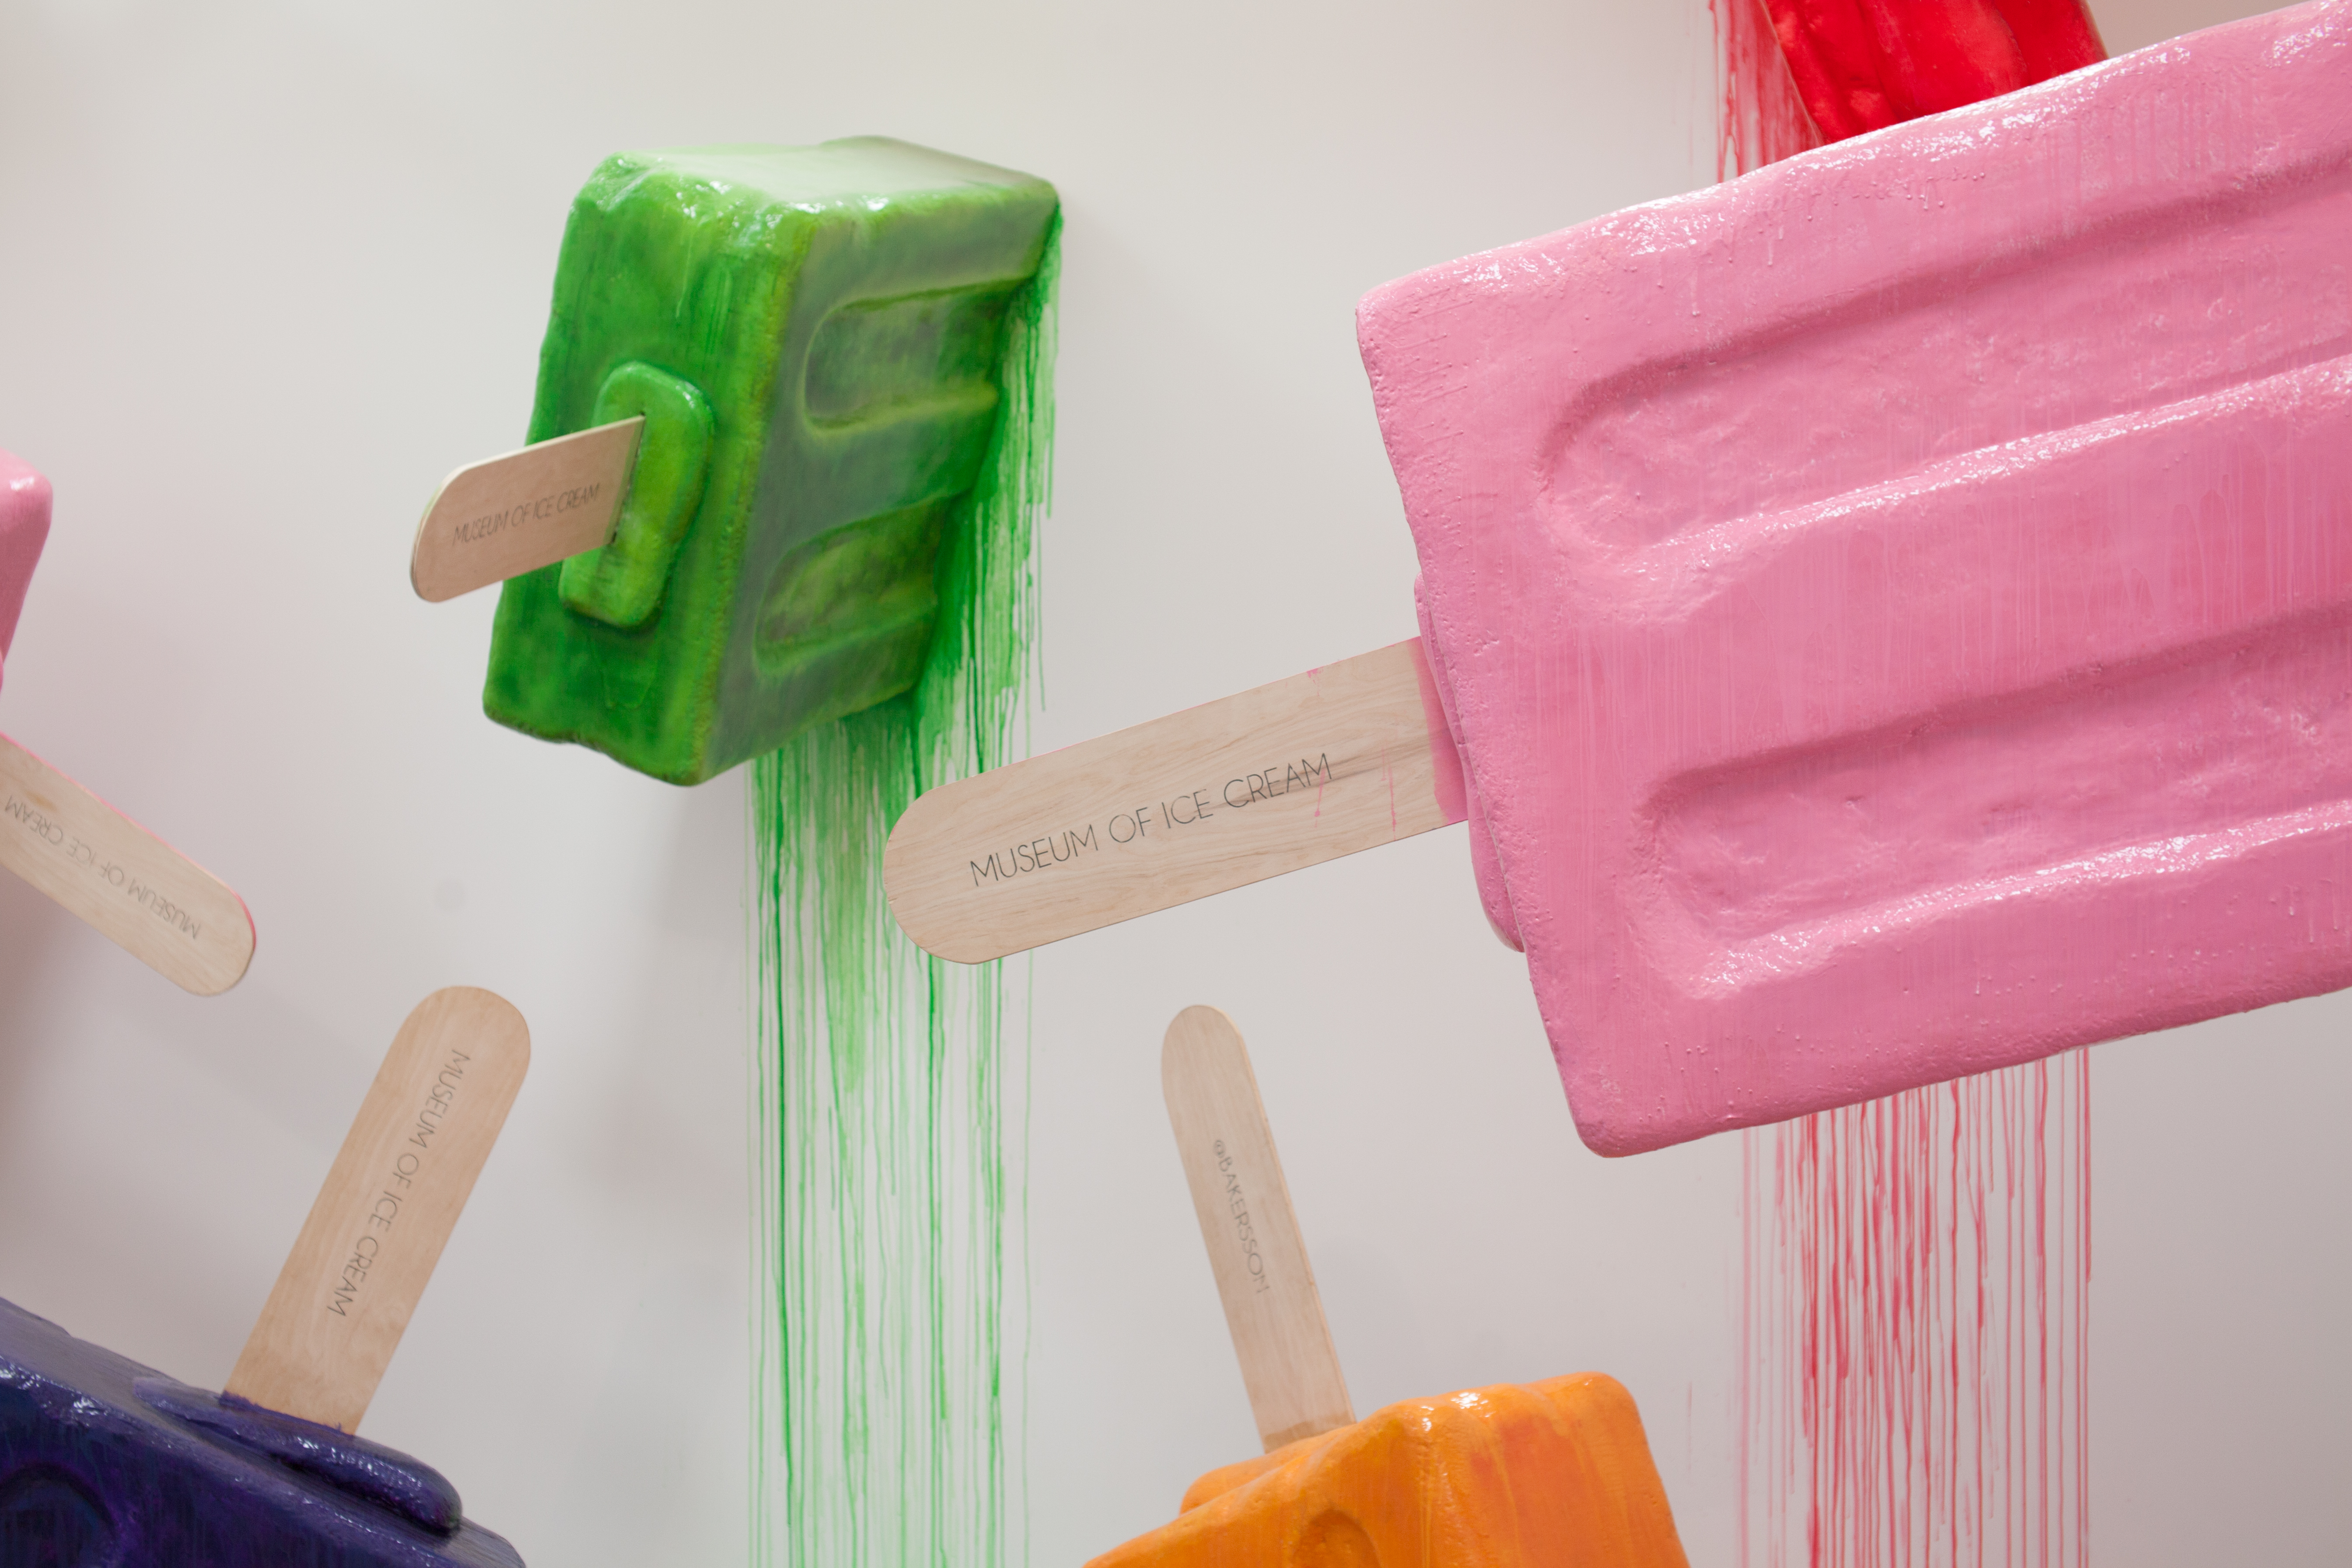 museum of ice cream LA